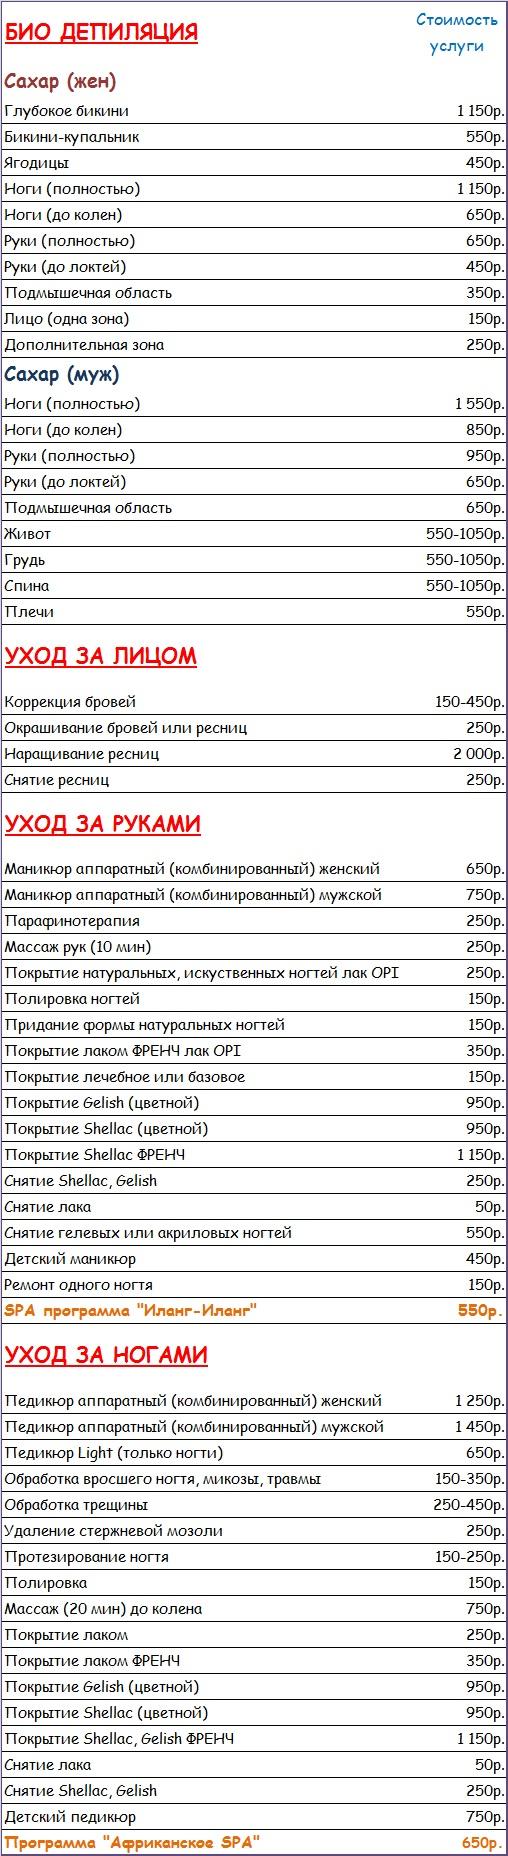 Price_ot_Caxar_11.08.2012